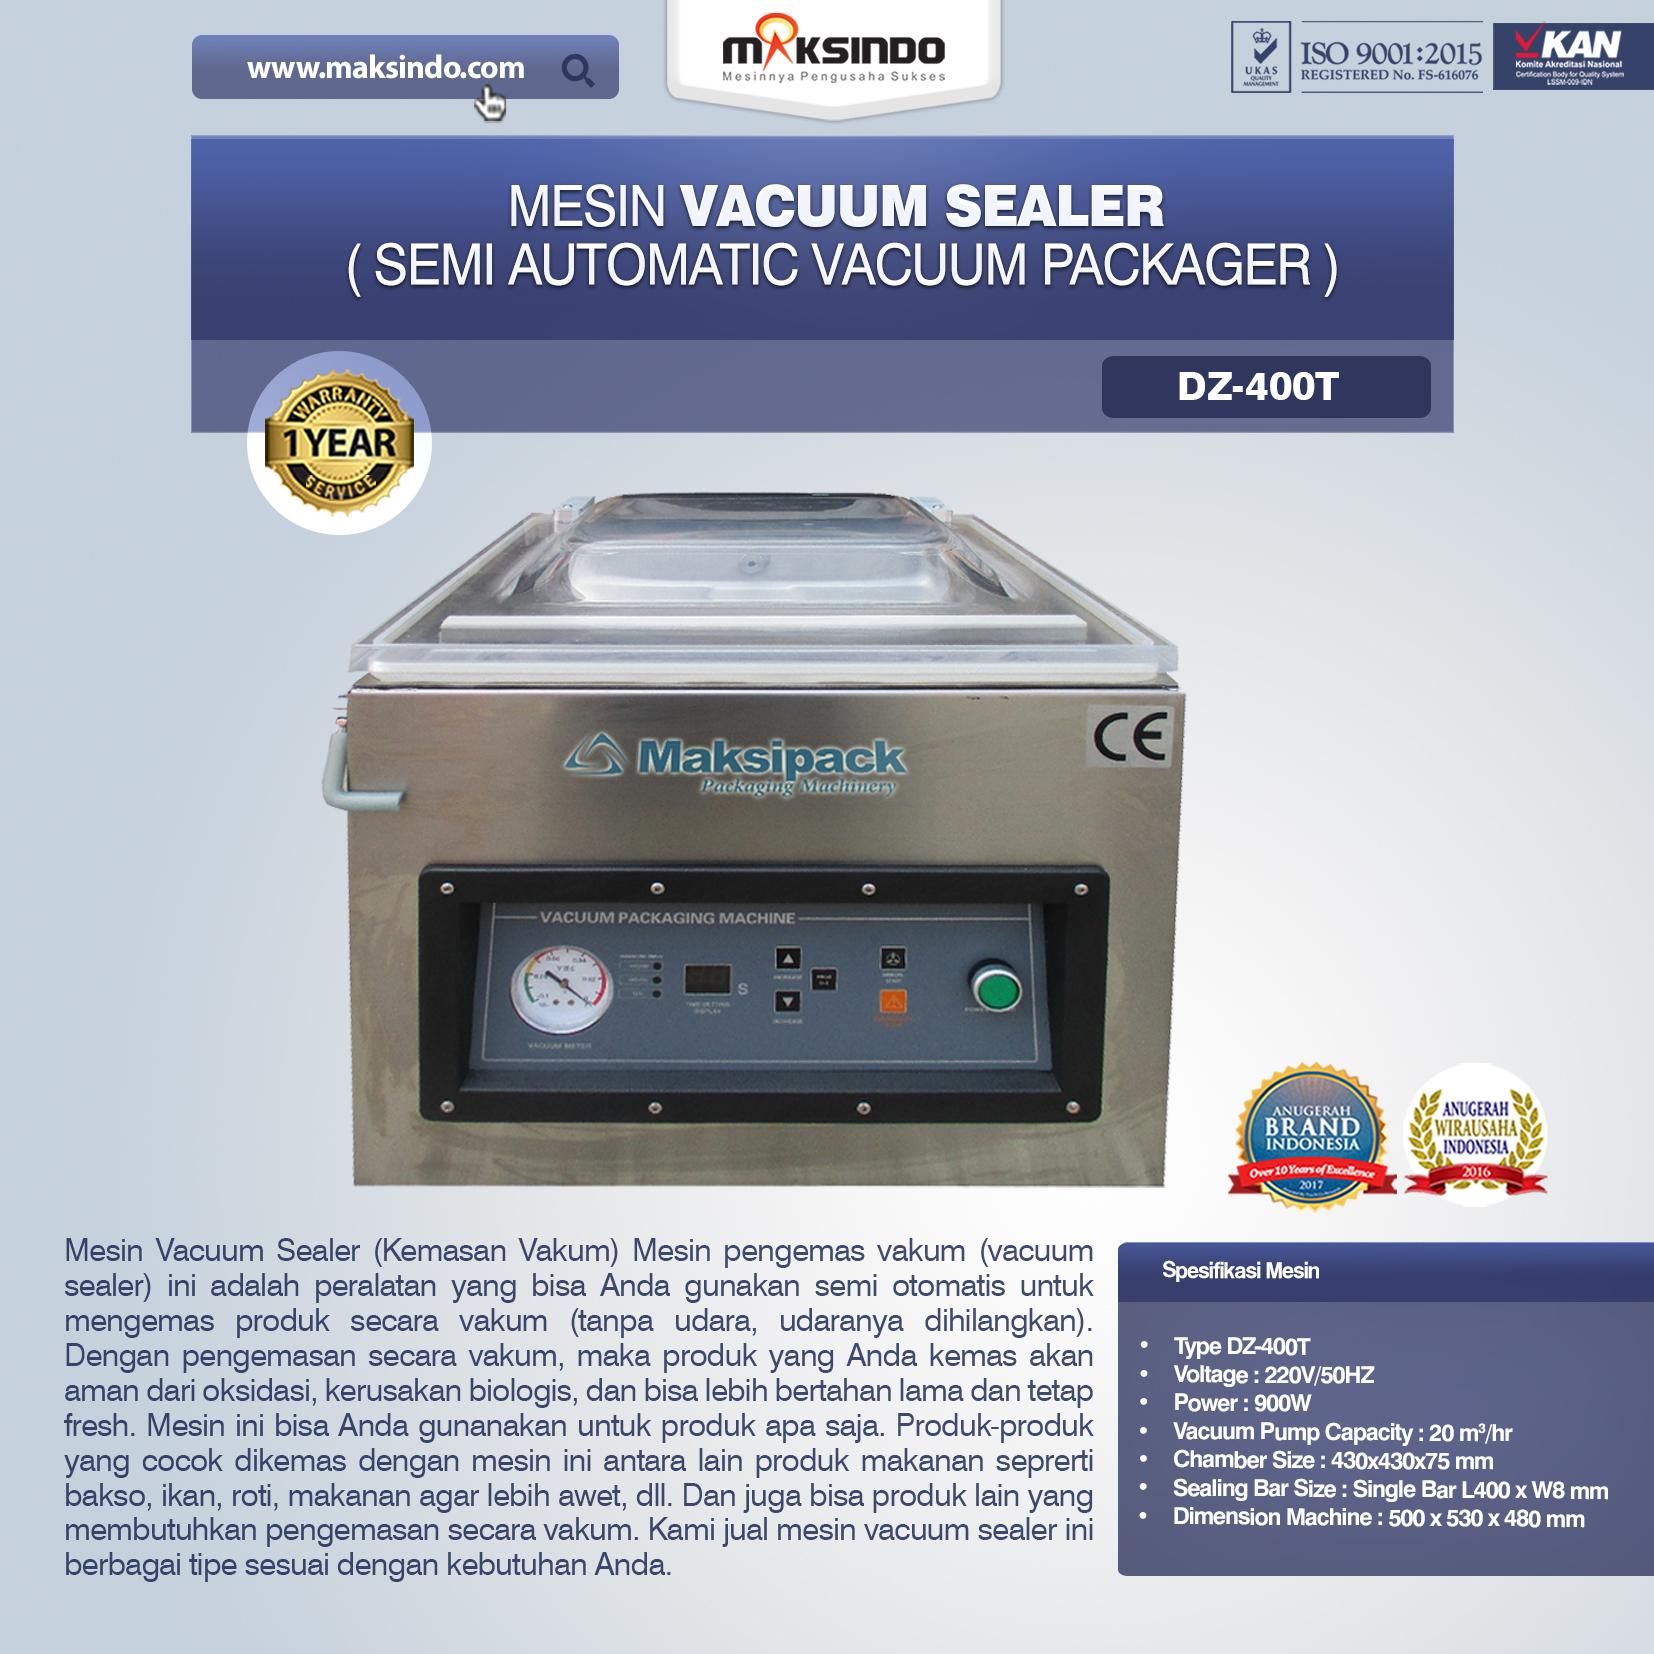 Mesin-Vacuum-Sealer-DZ-400T